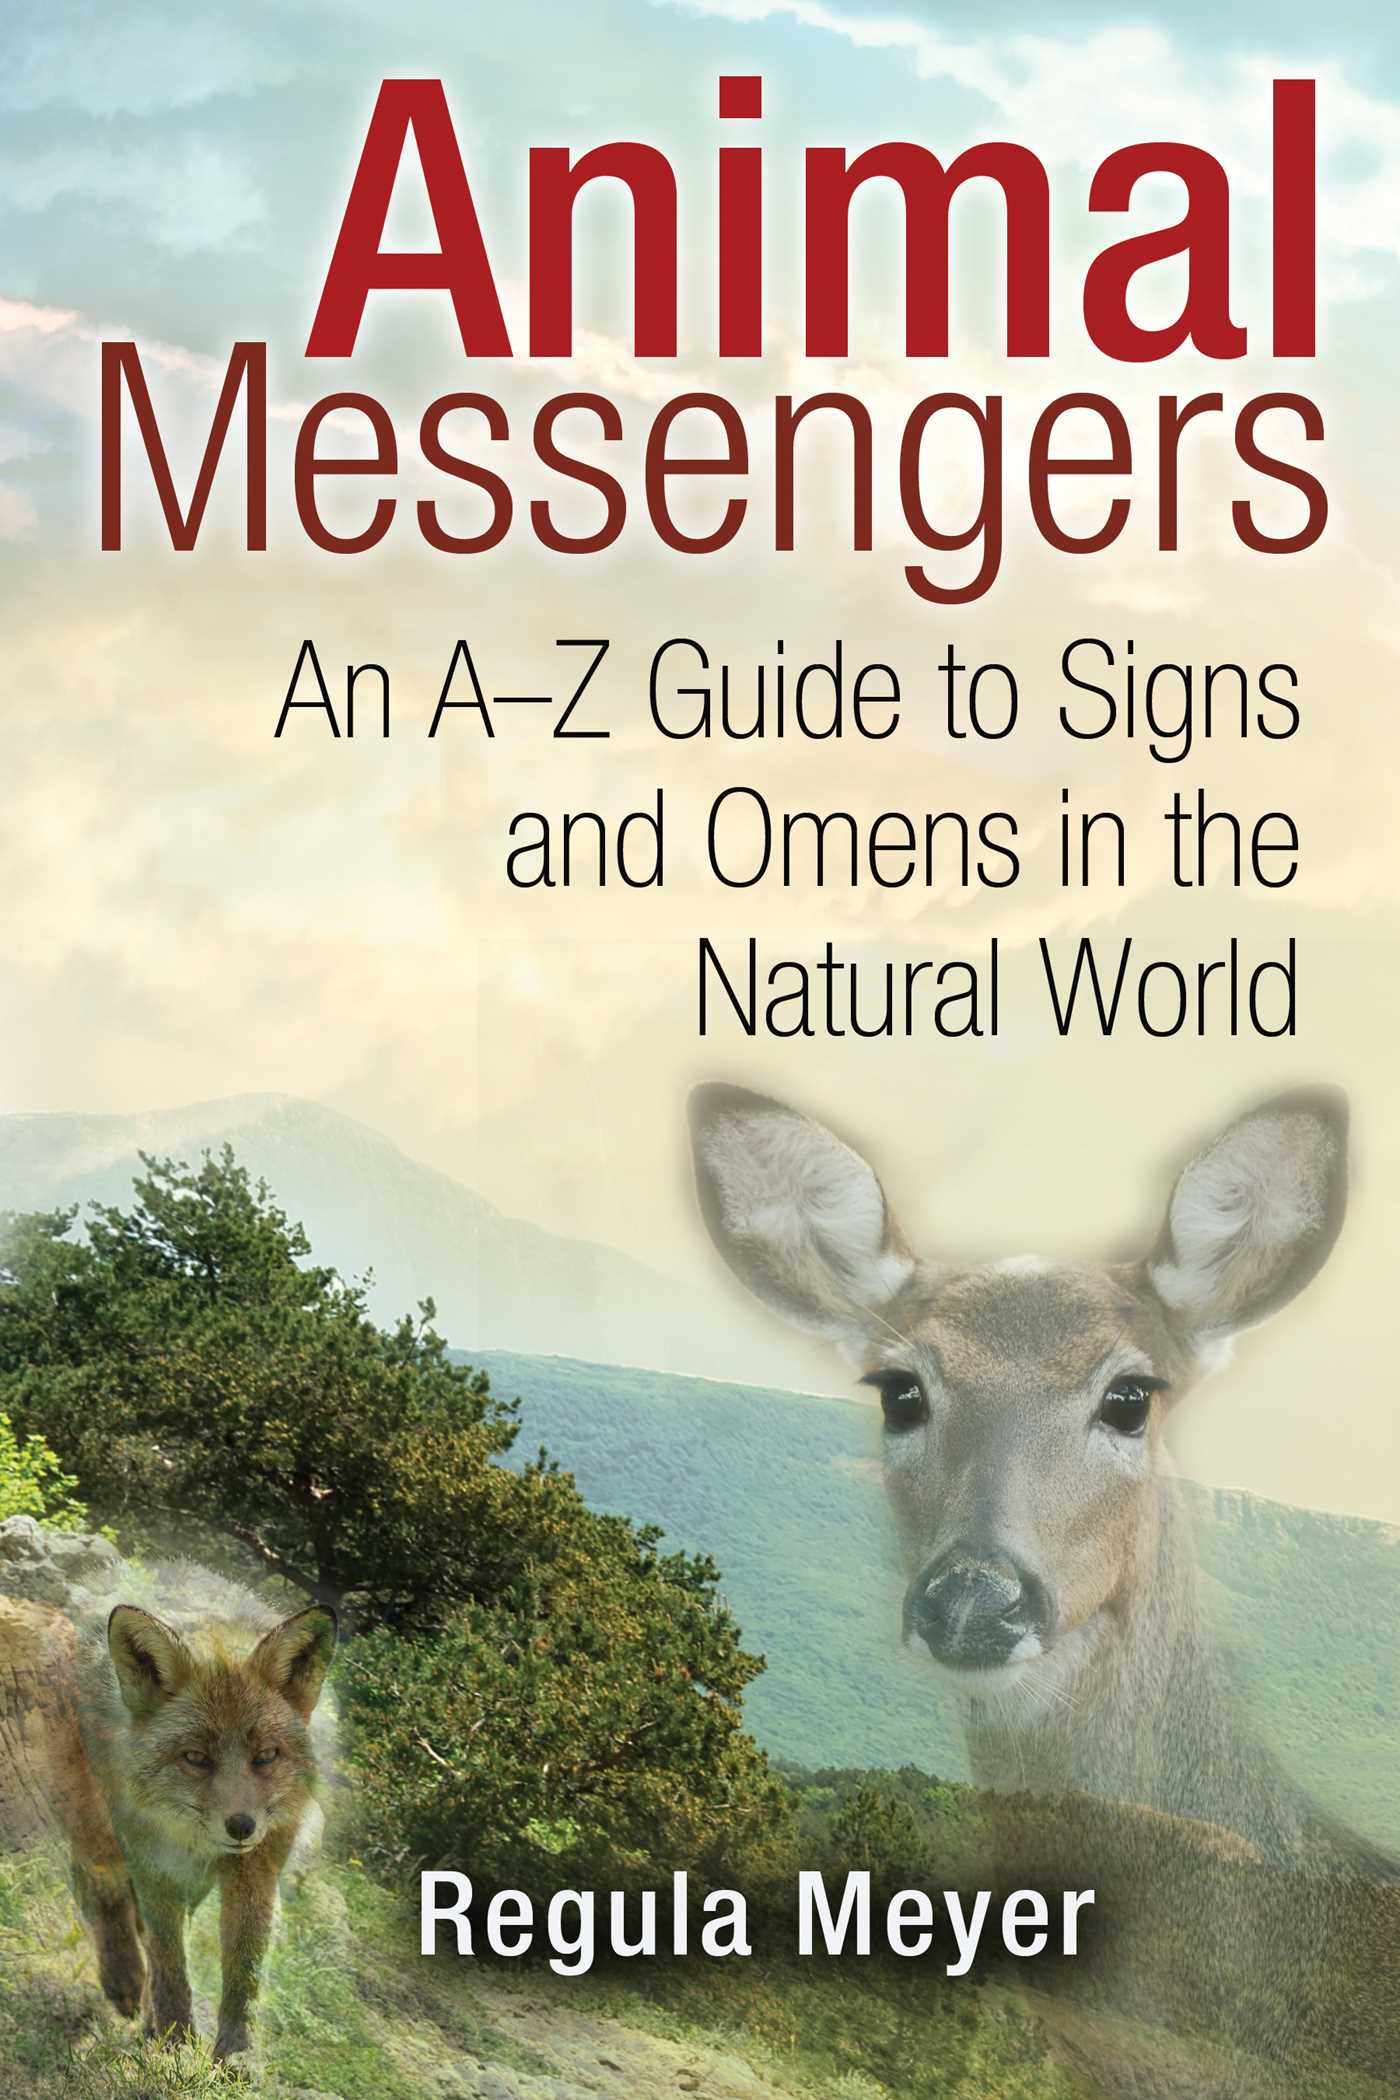 Animal messengers 9781591431619 hr